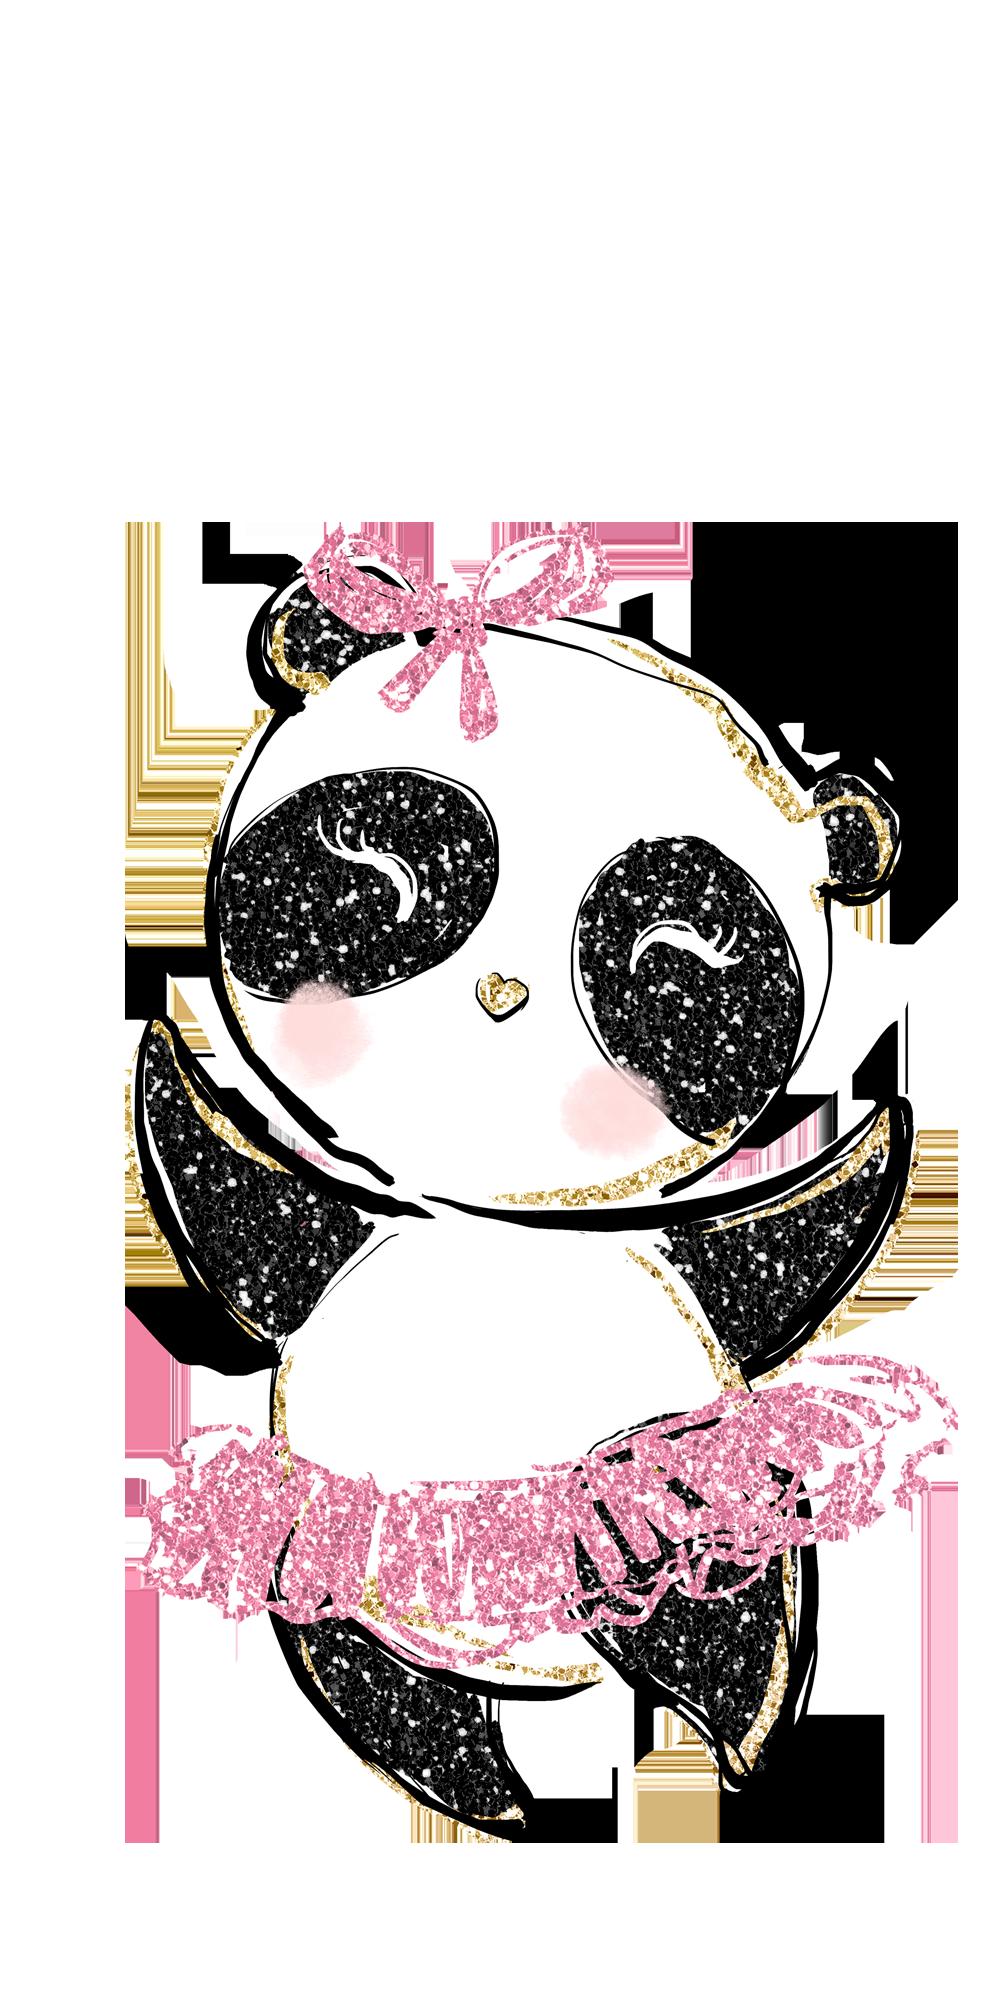 Dancing Panda Casetify Iphone Art Design Illustration Cute Animals Ballet Panda Wallpaper Iphone Wallpaper Iphone Cute Dance Wallpaper